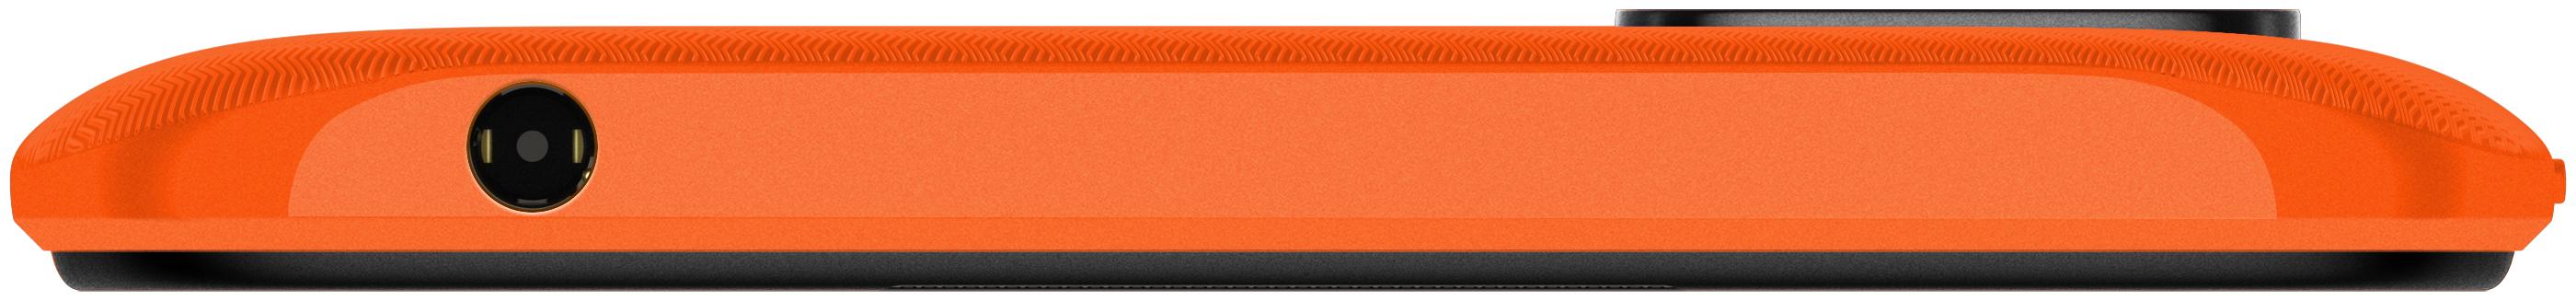 Xiaomi Redmi 9C 3/64GB (NFC) - интернет: 4G LTE